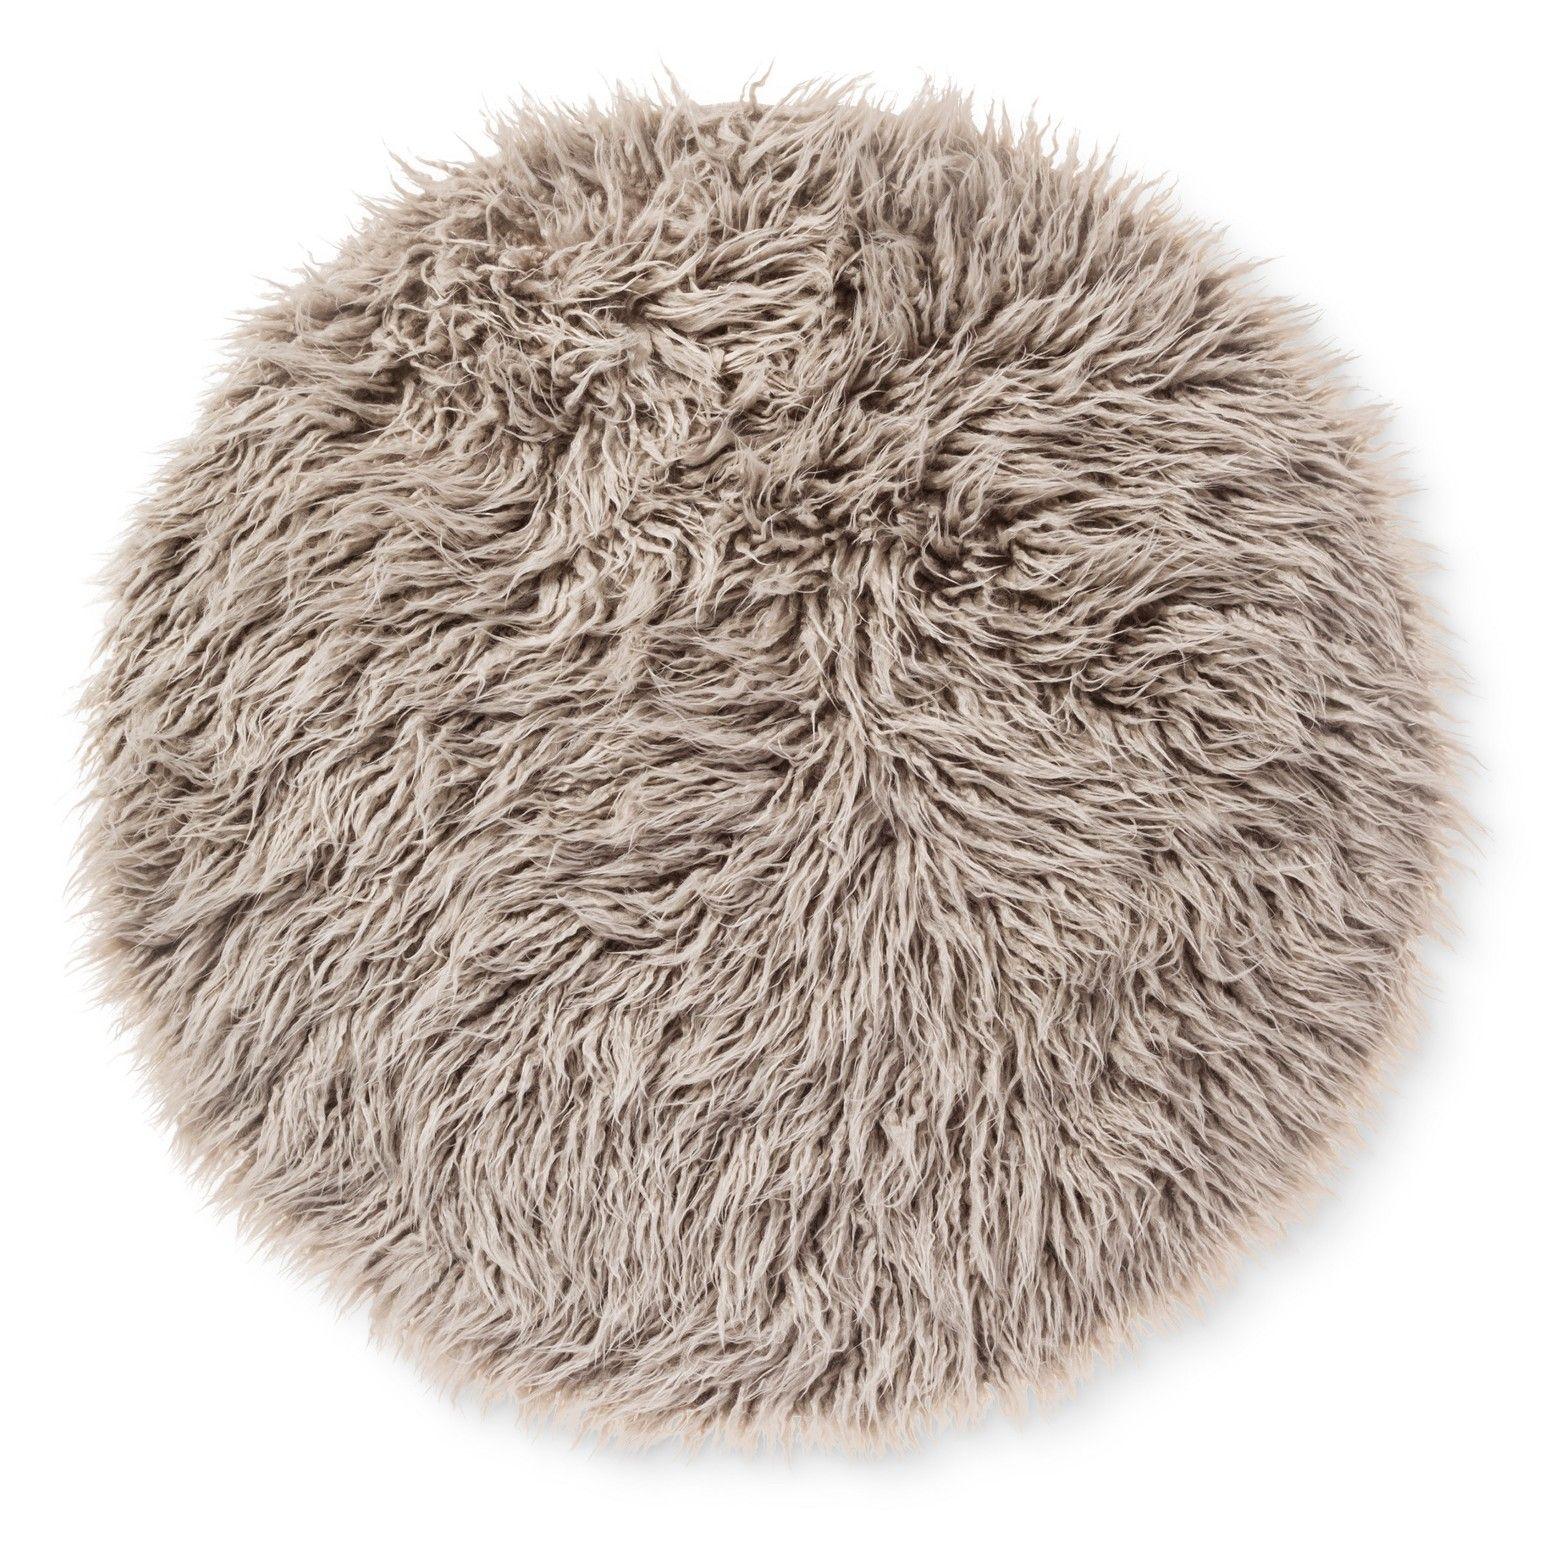 Faux Fur Rug 3 Round Gray Pillowfort Faux Fur Rug Faux Fur Area Rug Fur Rug [ 1560 x 1560 Pixel ]